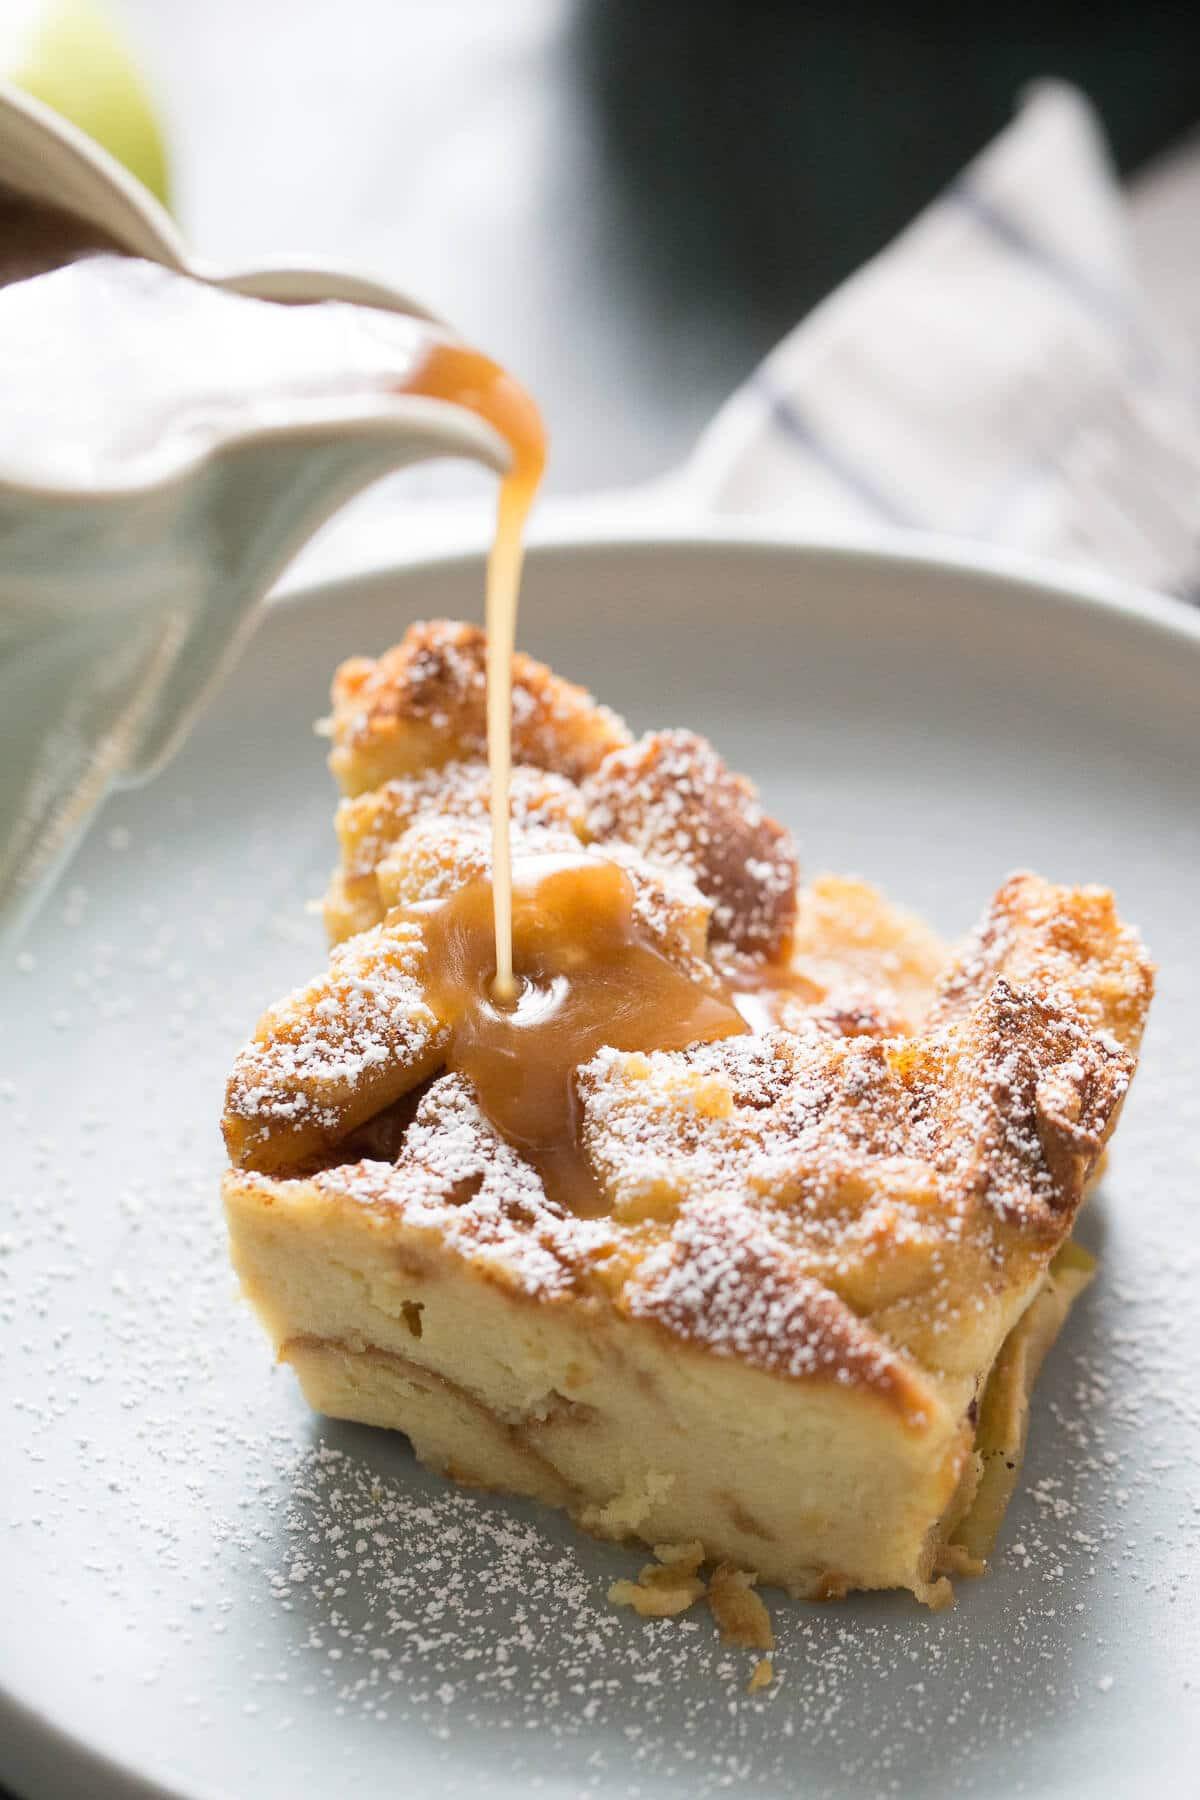 Bread Pudding Dessert  Apples Foster Bread Pudding Recipe LemonsforLulu